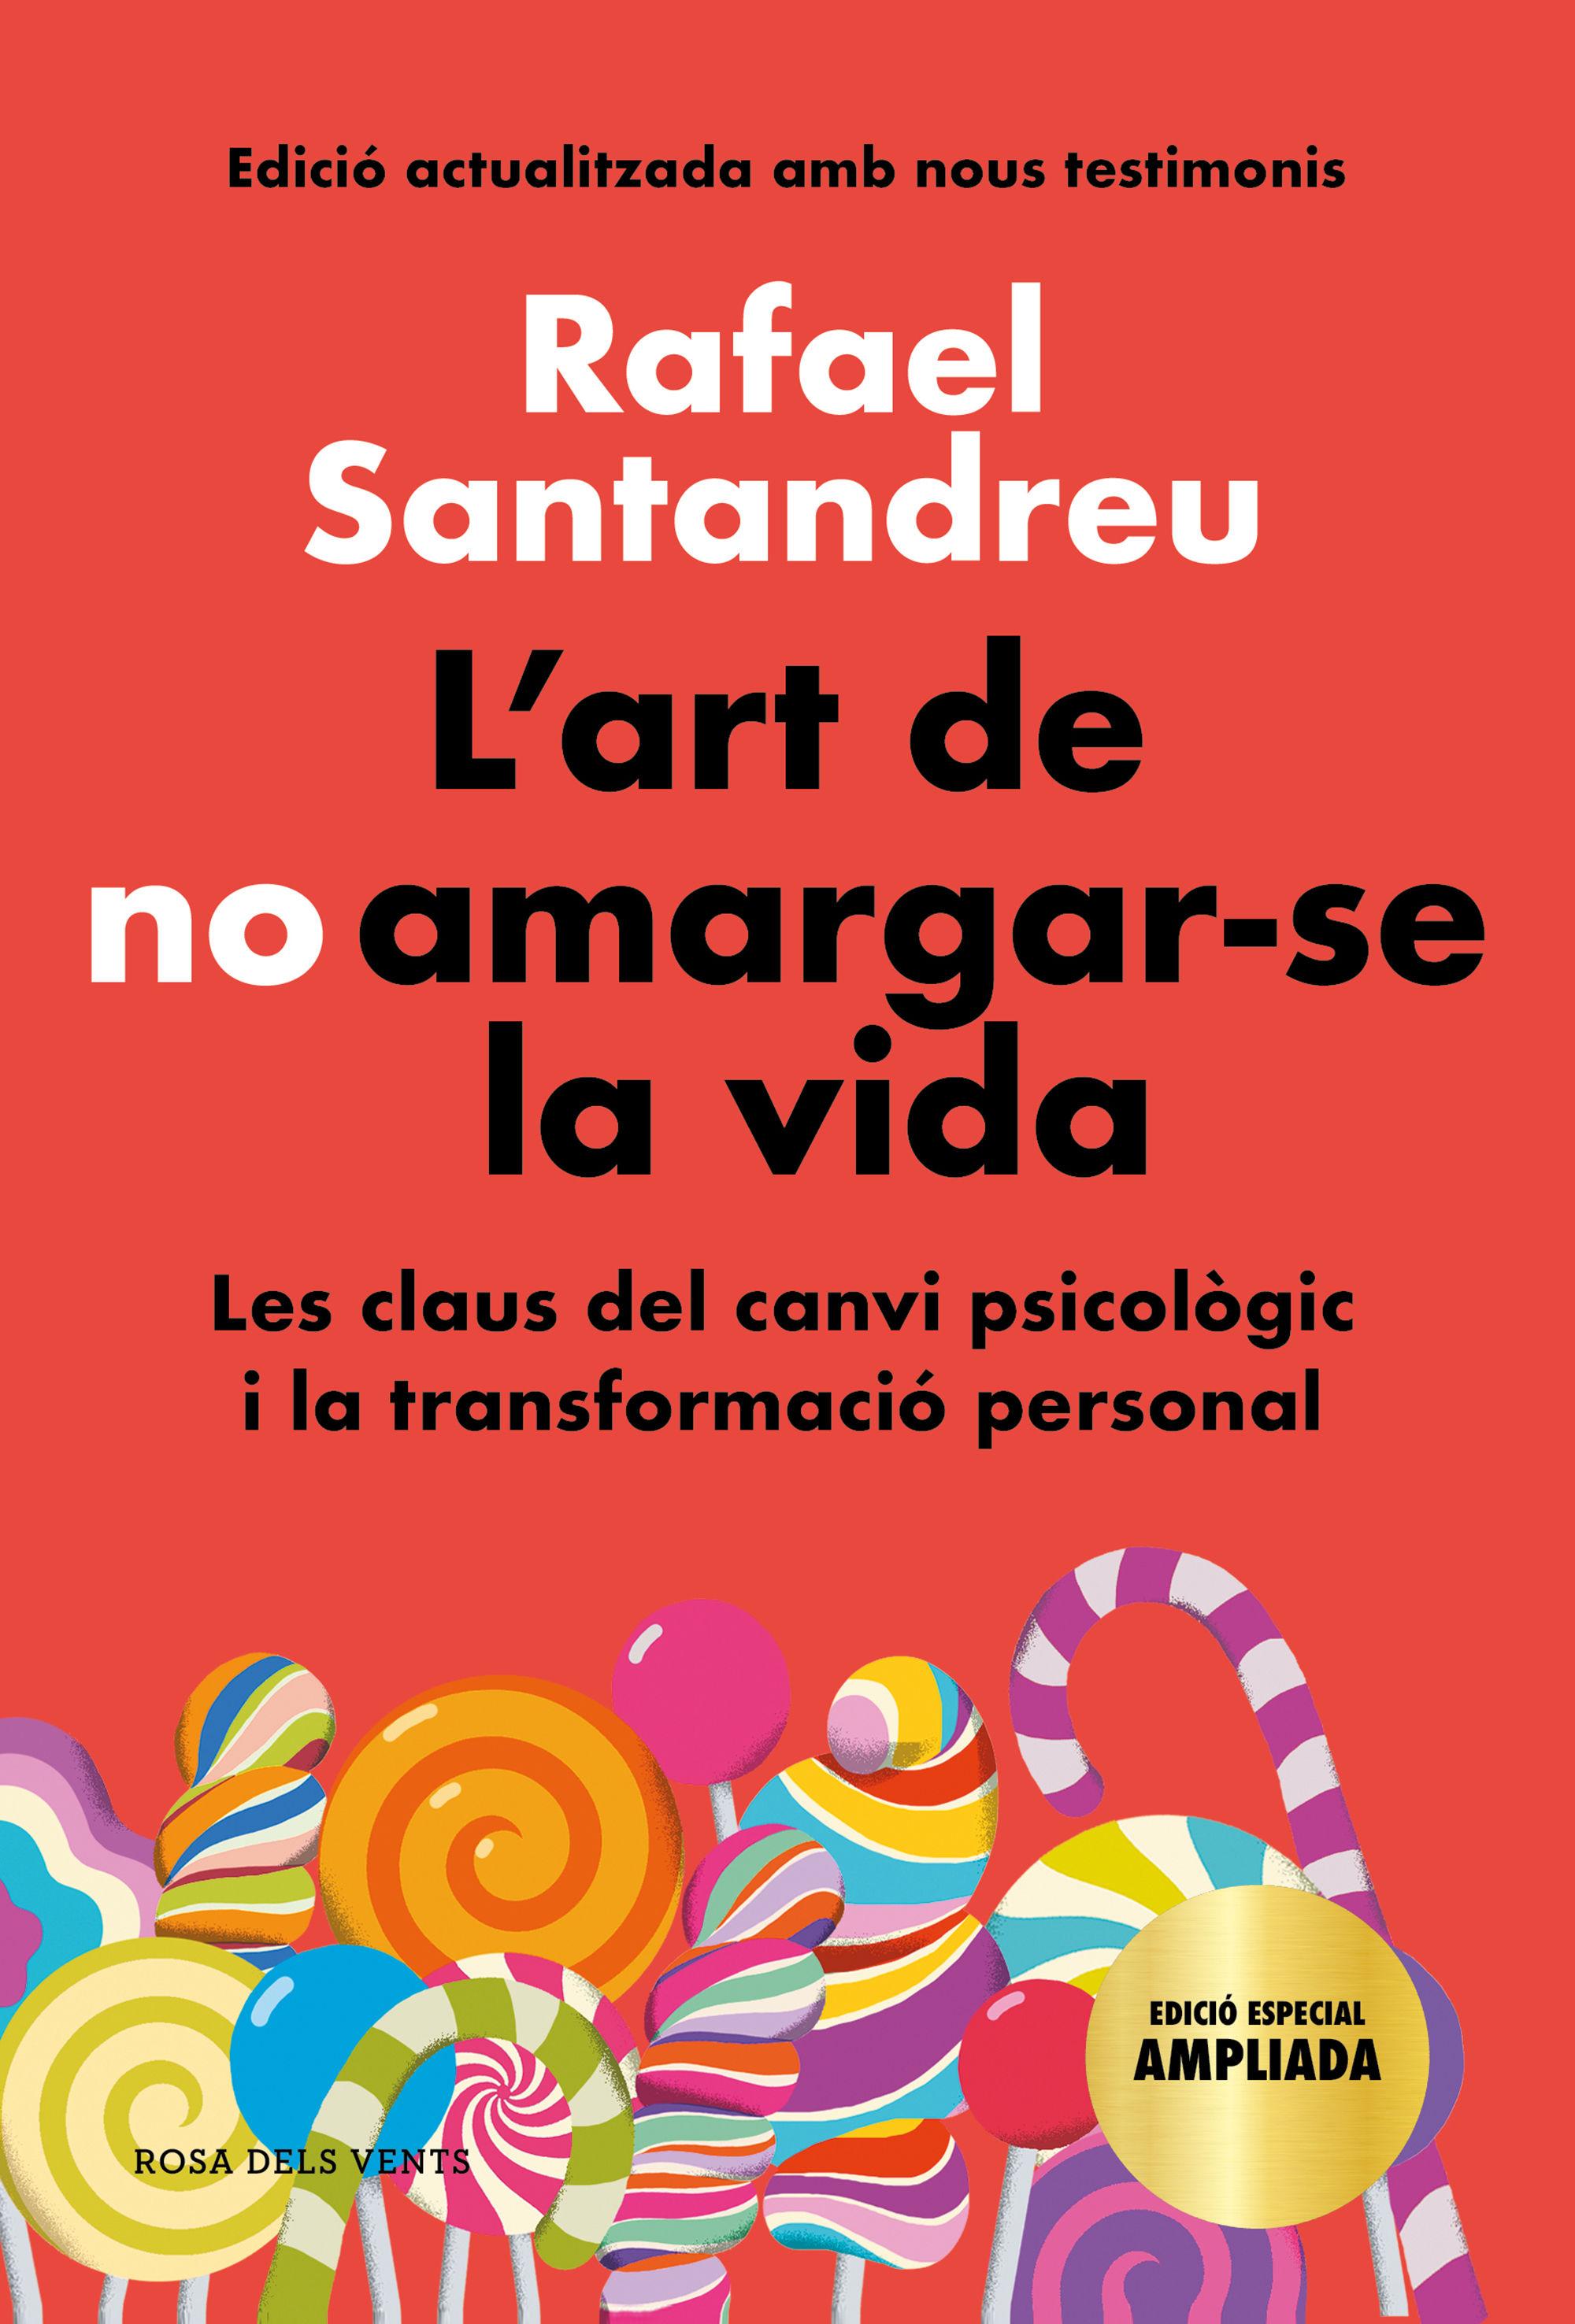 ART DE NO AMARGAR SE LA VIDA